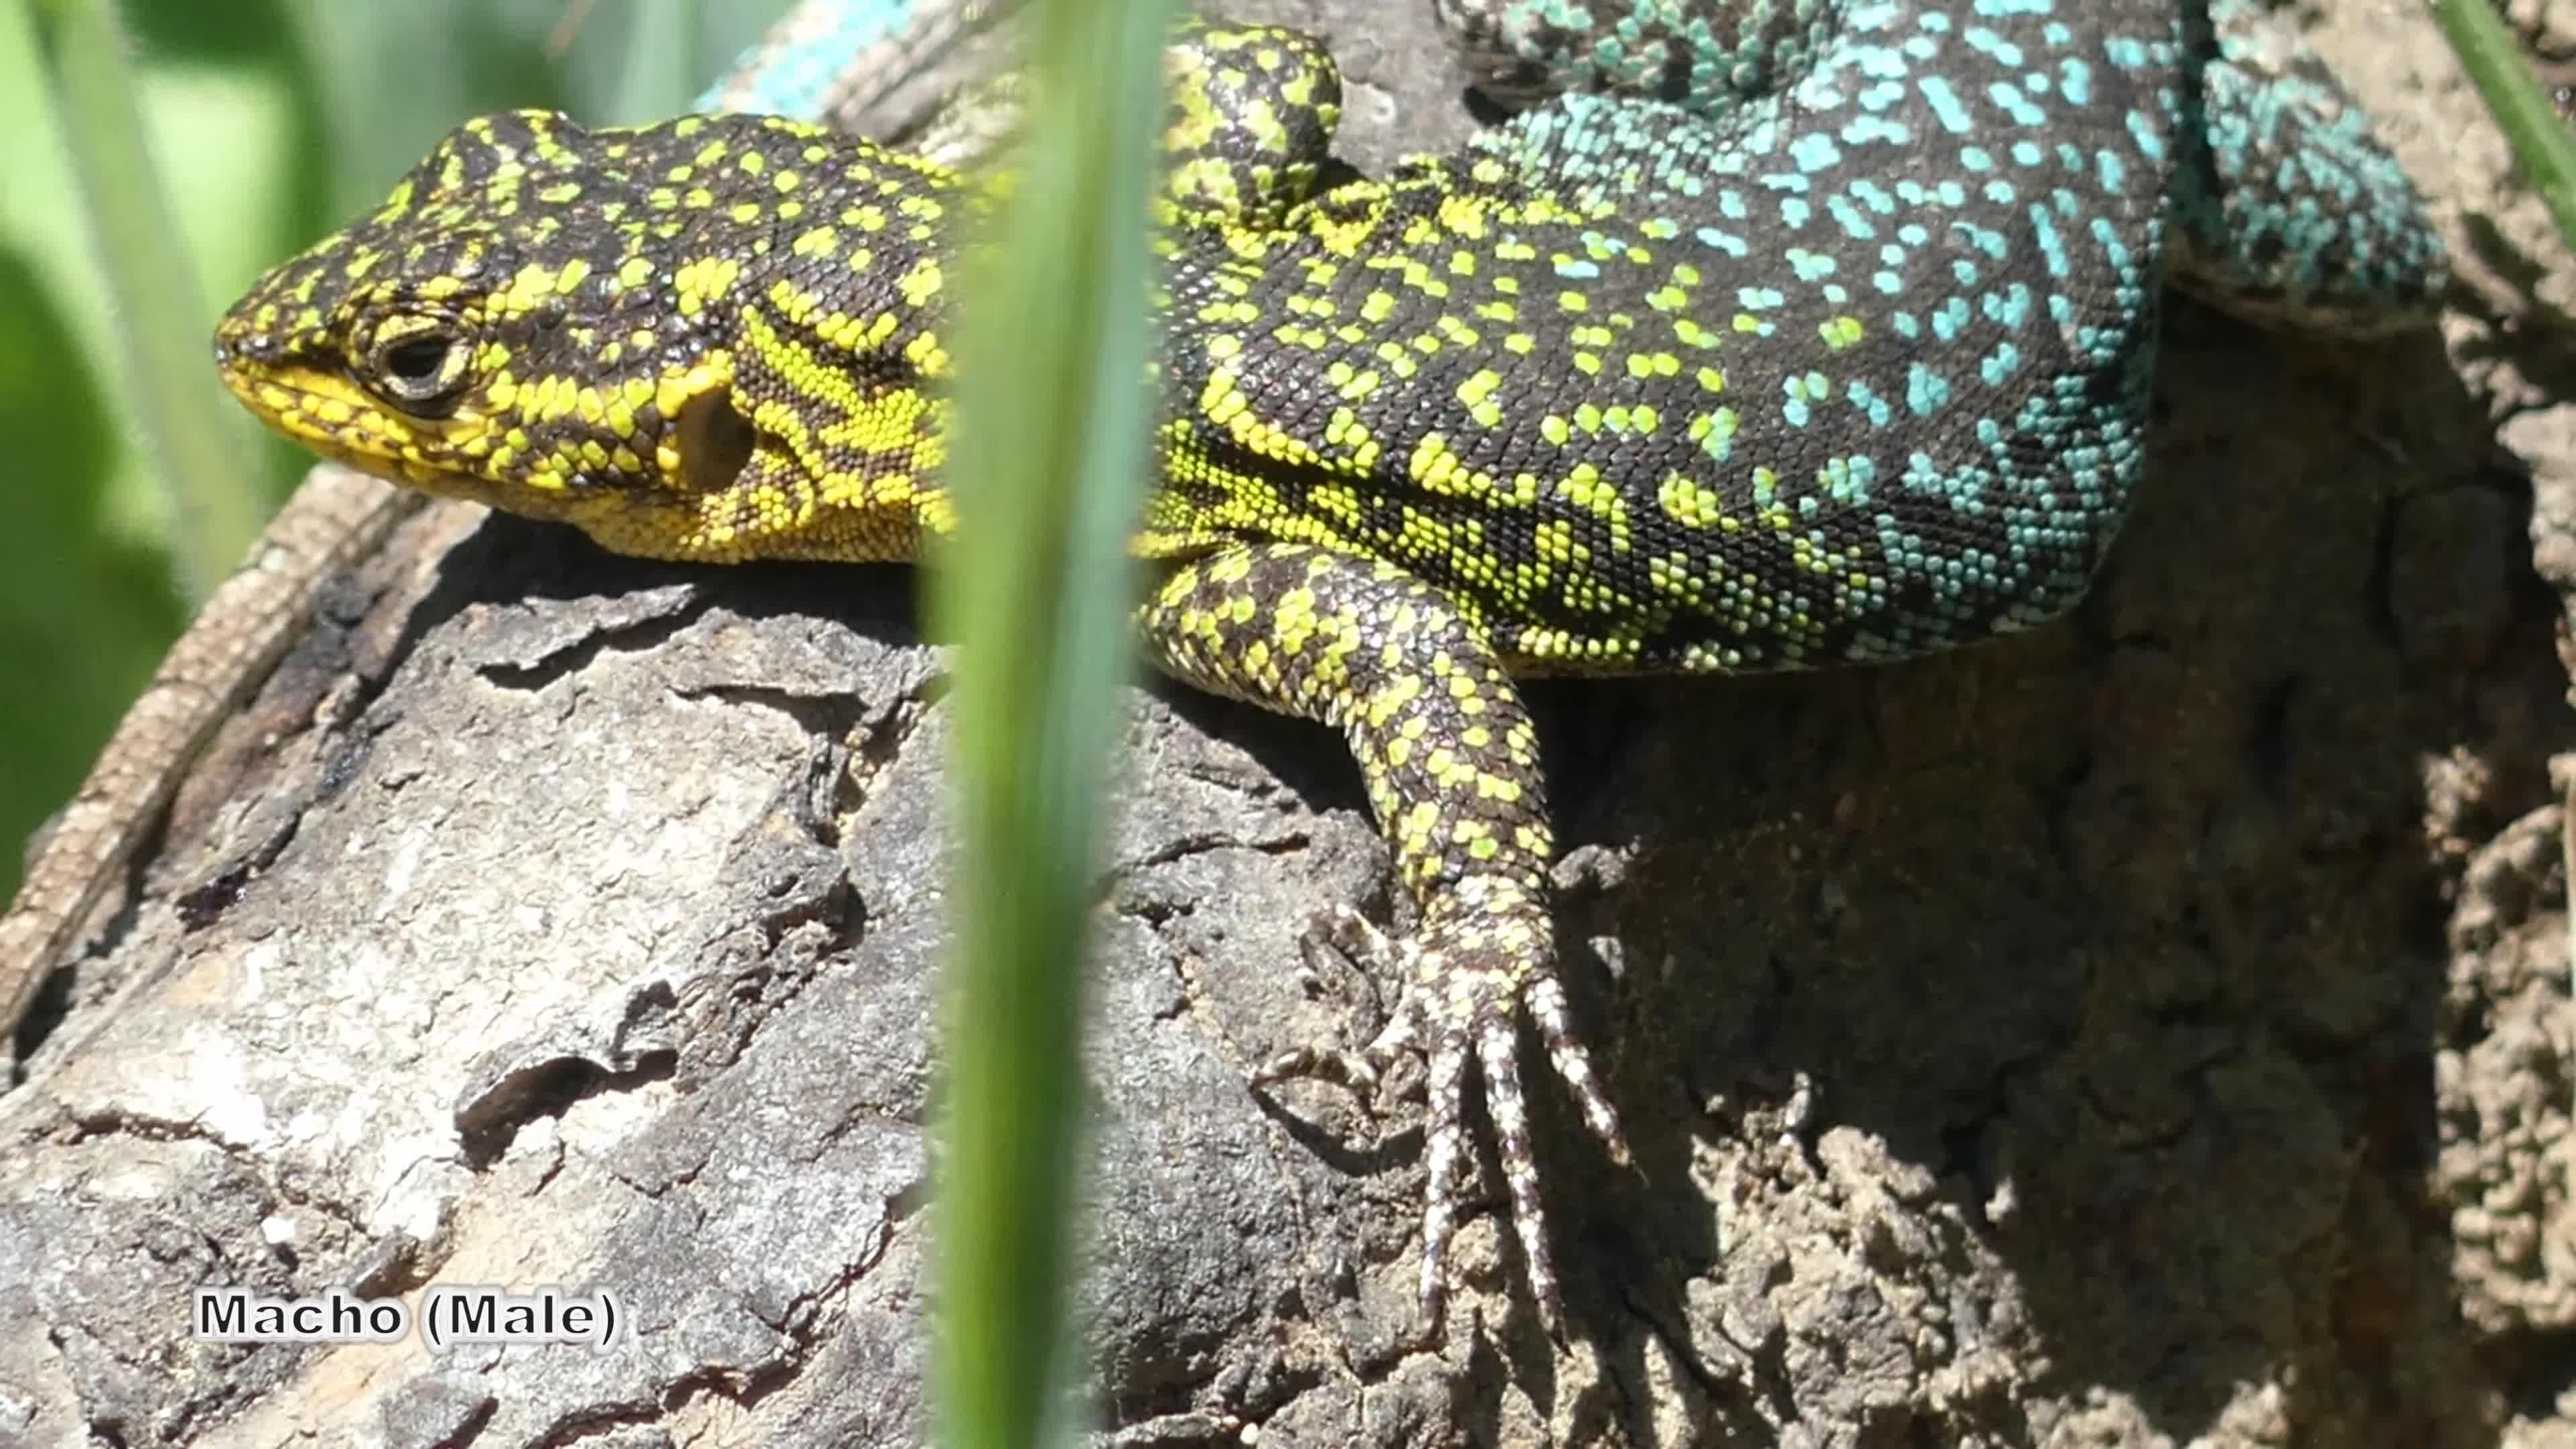 Fauna de Chile, Pets & Animals, Lagartija tenue o esbelta (Liolaemus tenuis) GIFs